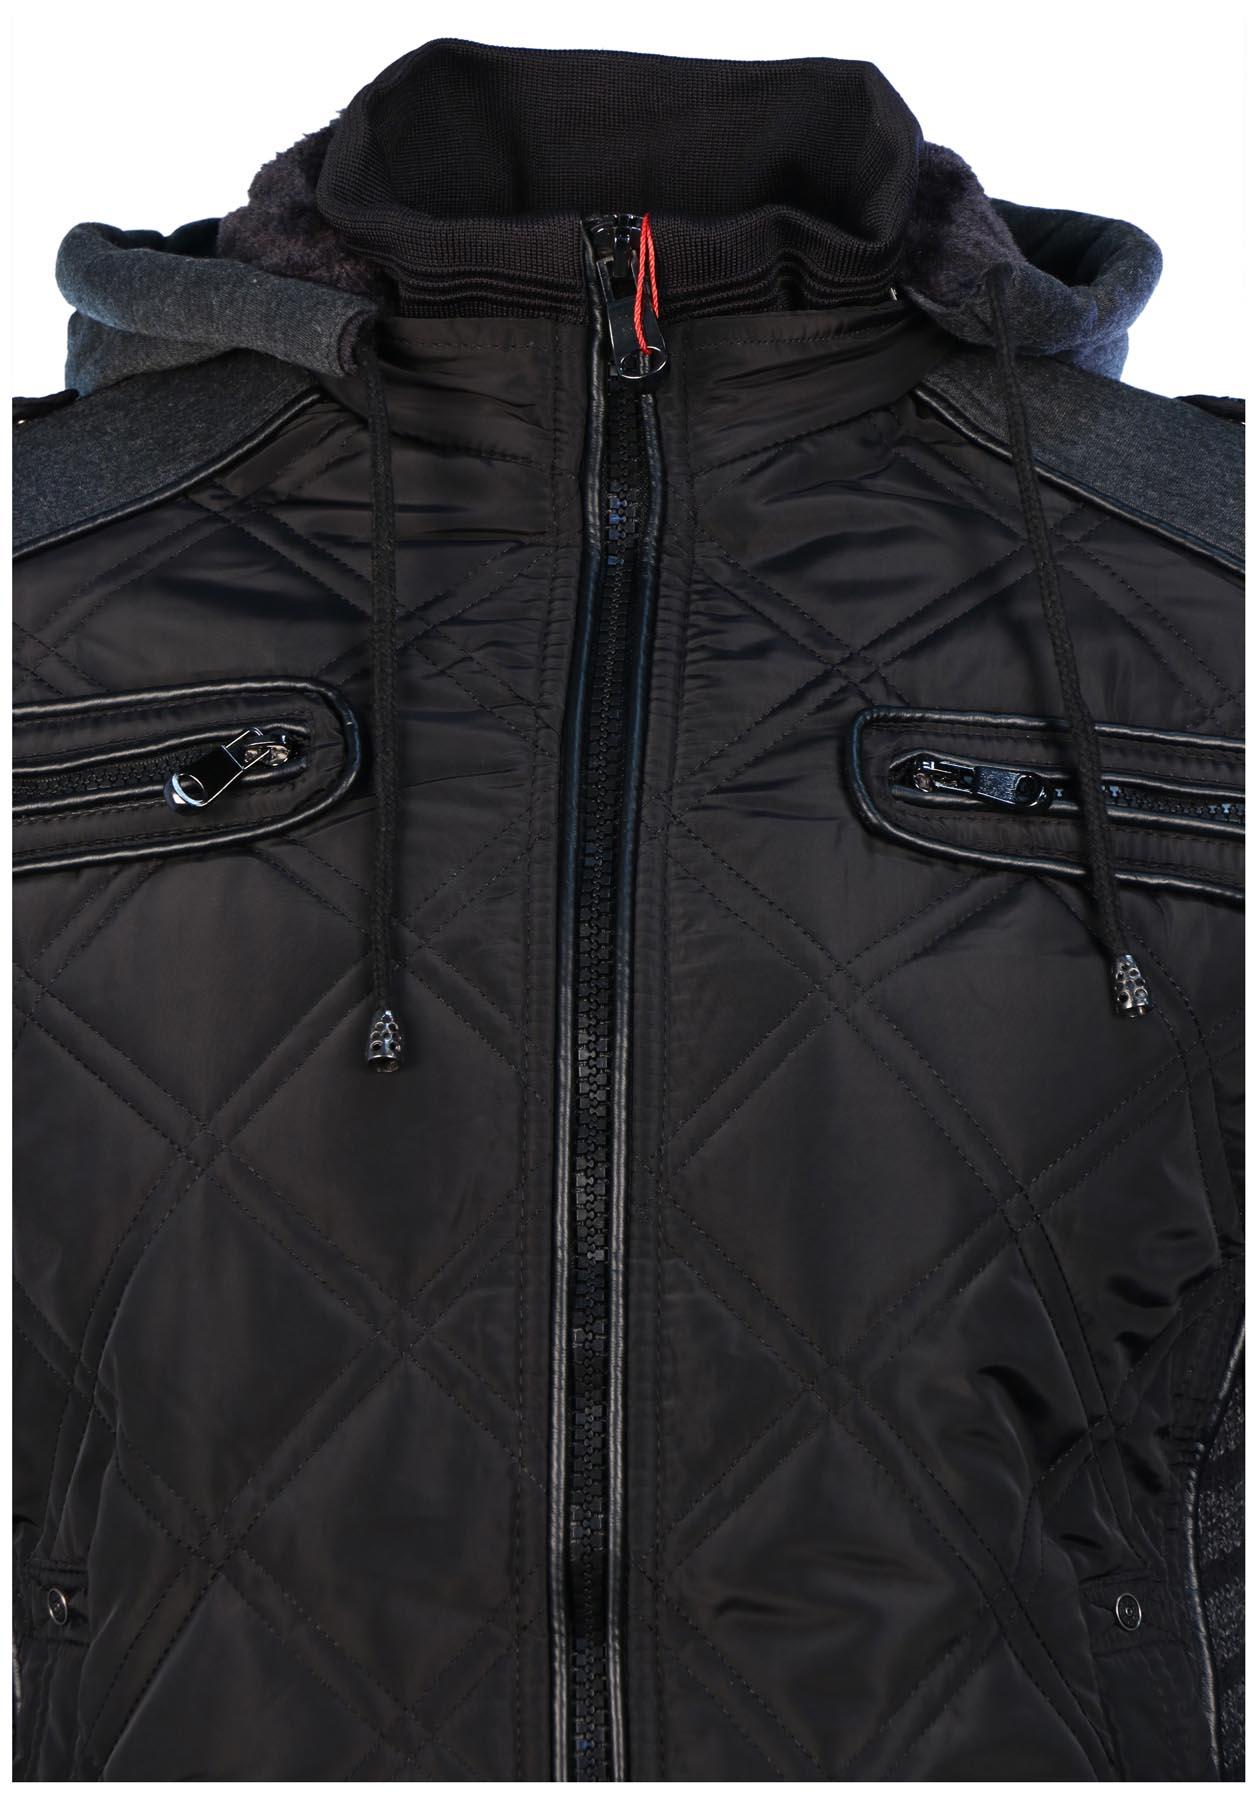 7a892836690f Maximos Men s Envy Hooded Full Zip Bomber Jacket